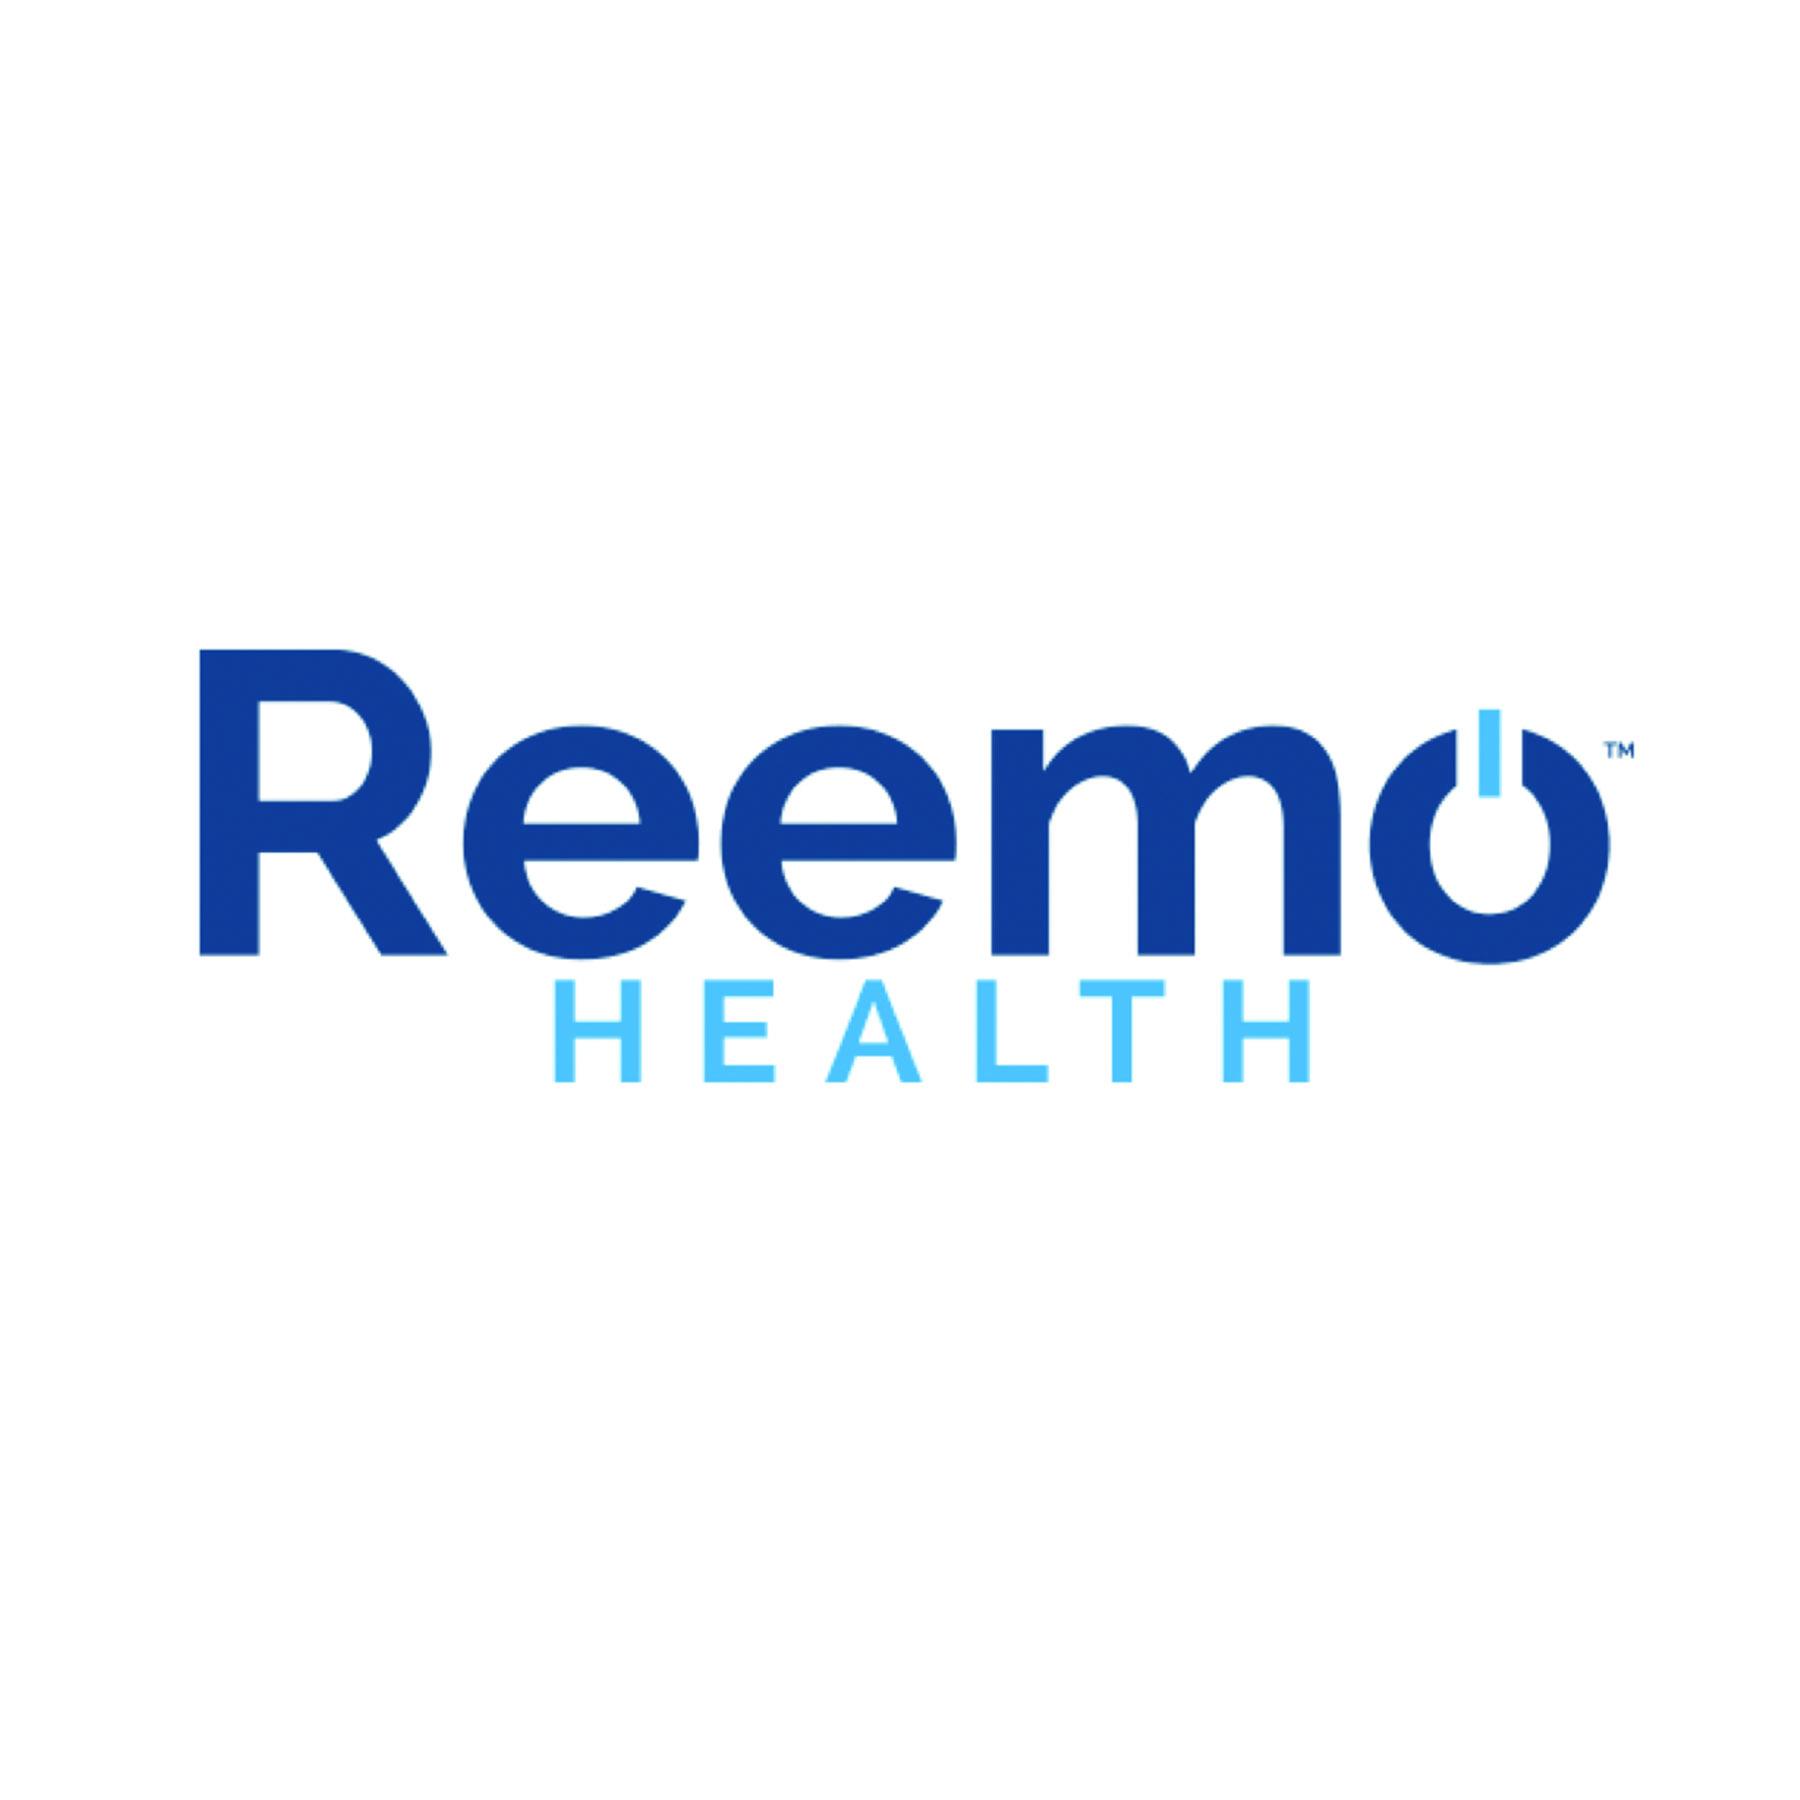 www.reemohealth.com